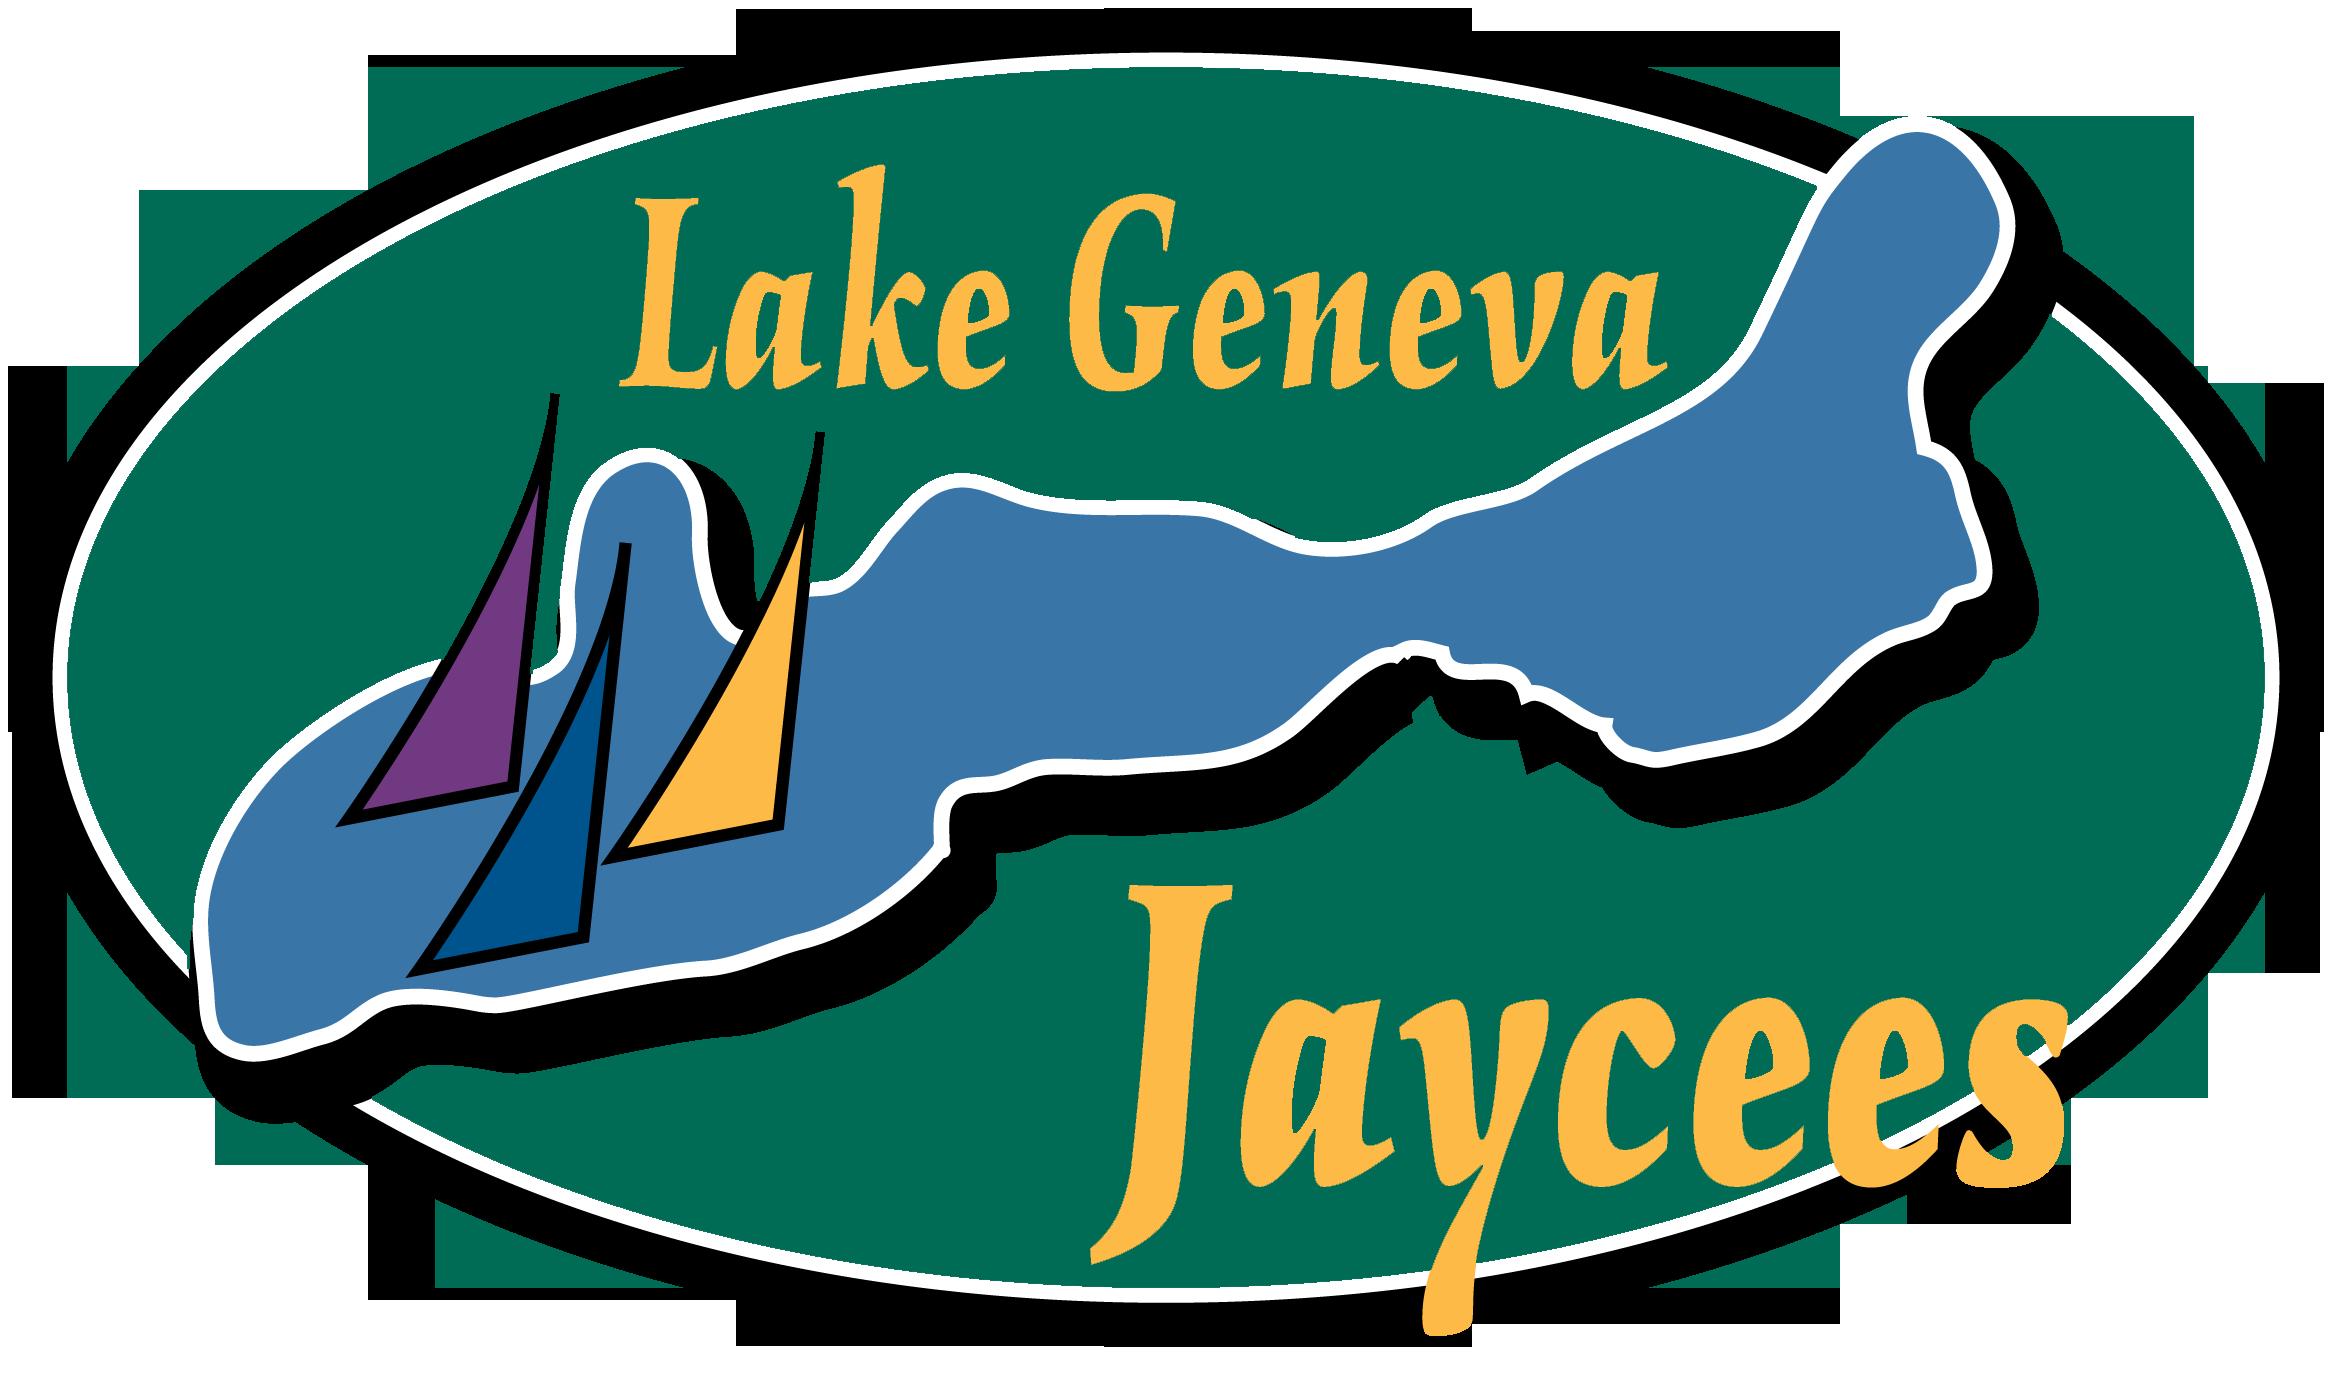 Lake Geneva Jaycees Golfing for Those in Need 2021 logo